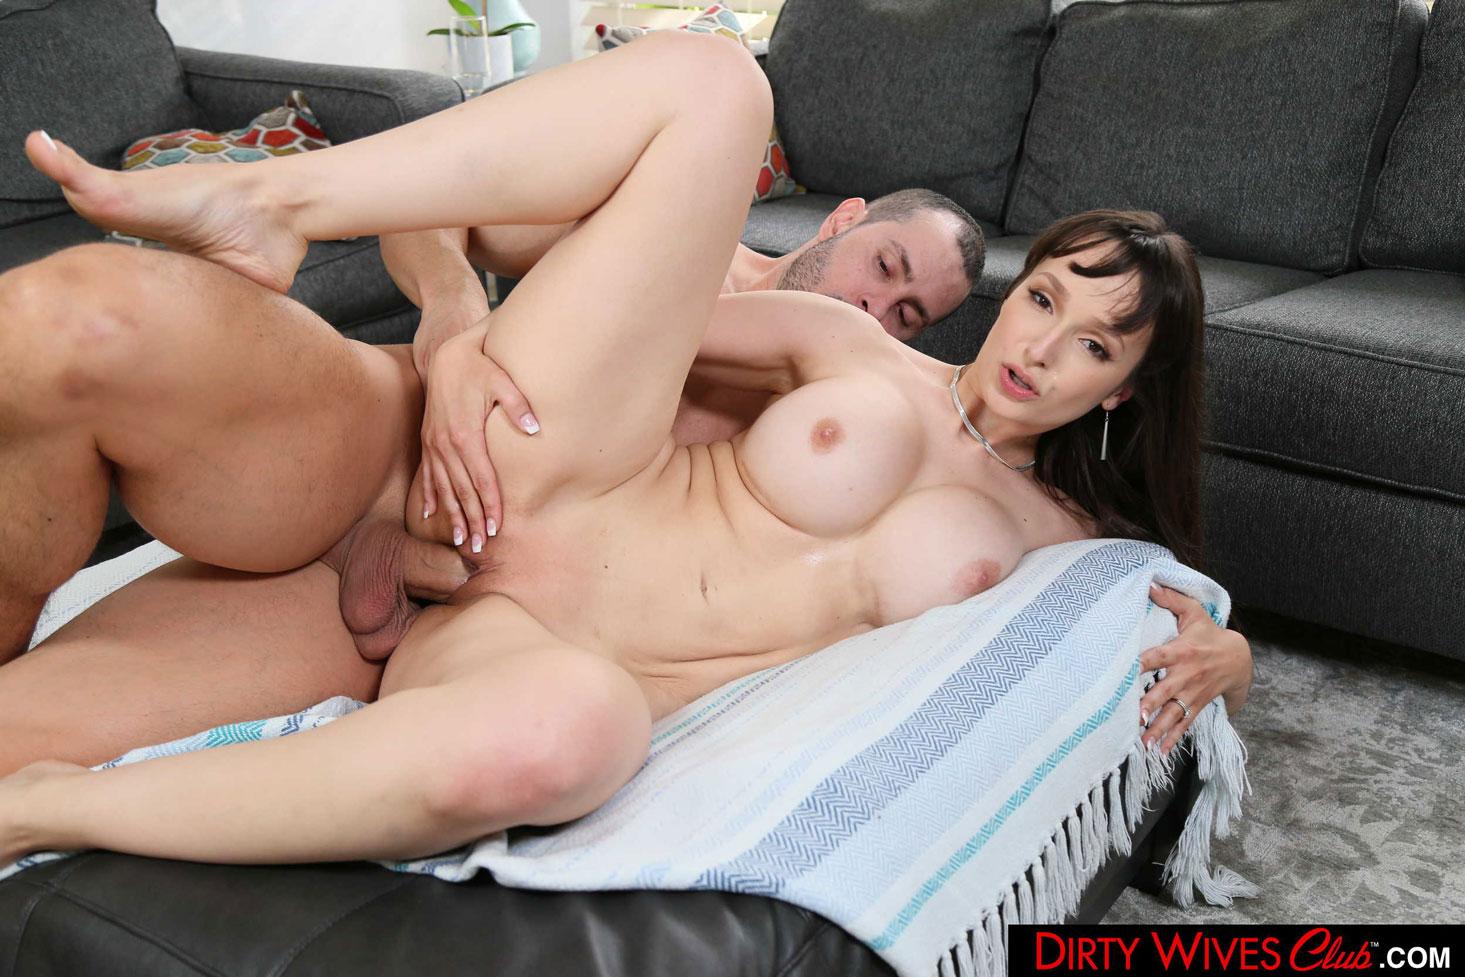 Girlsway - Lexi Luna Dirty Wife Rides Big Cock 11